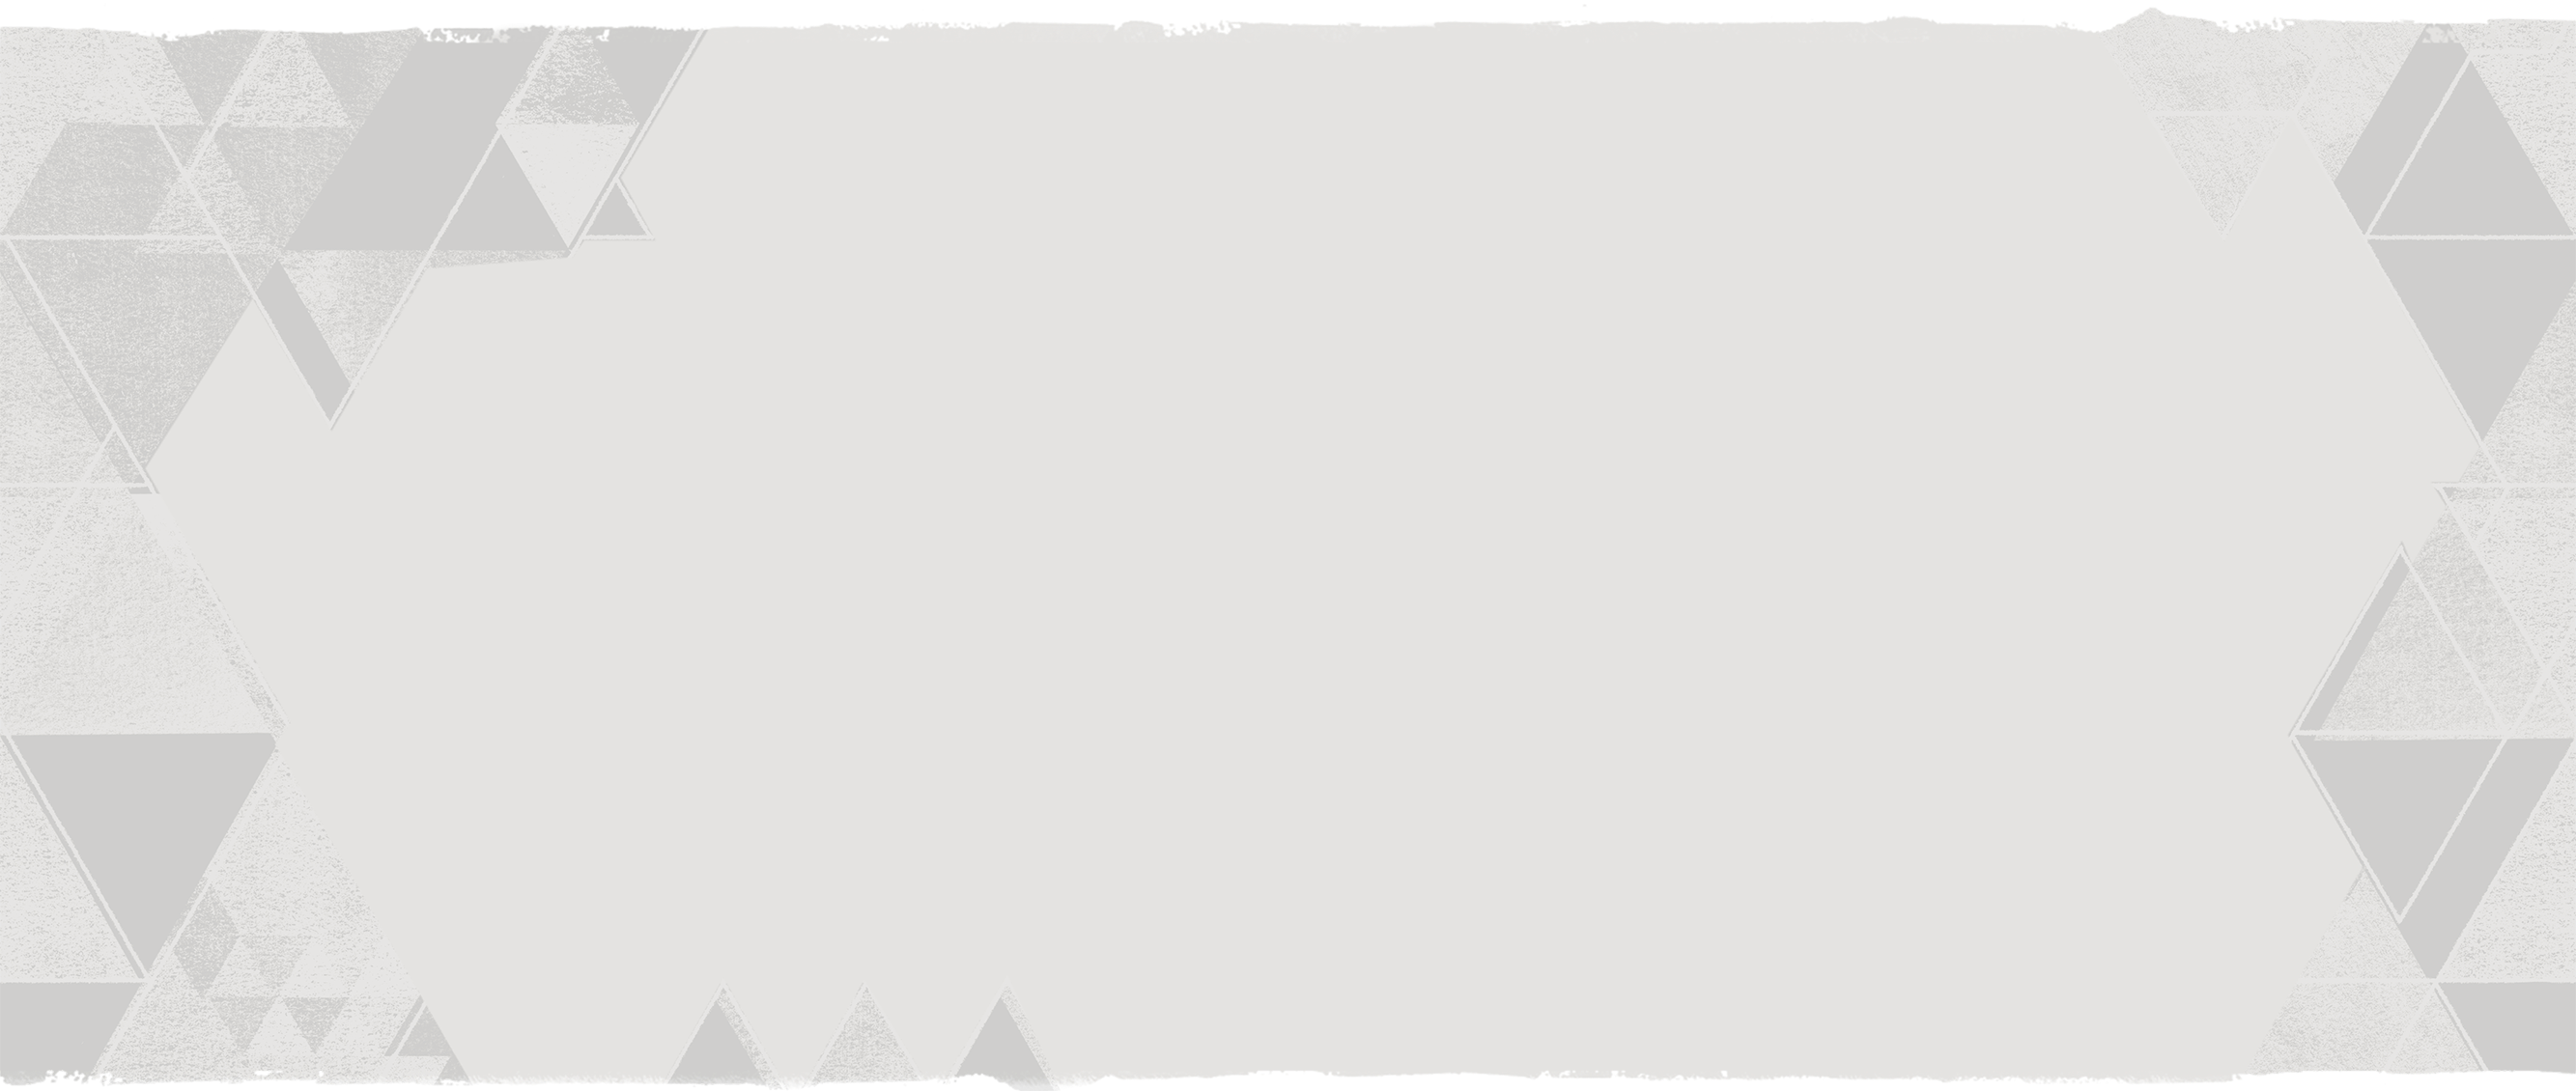 horizon grey background